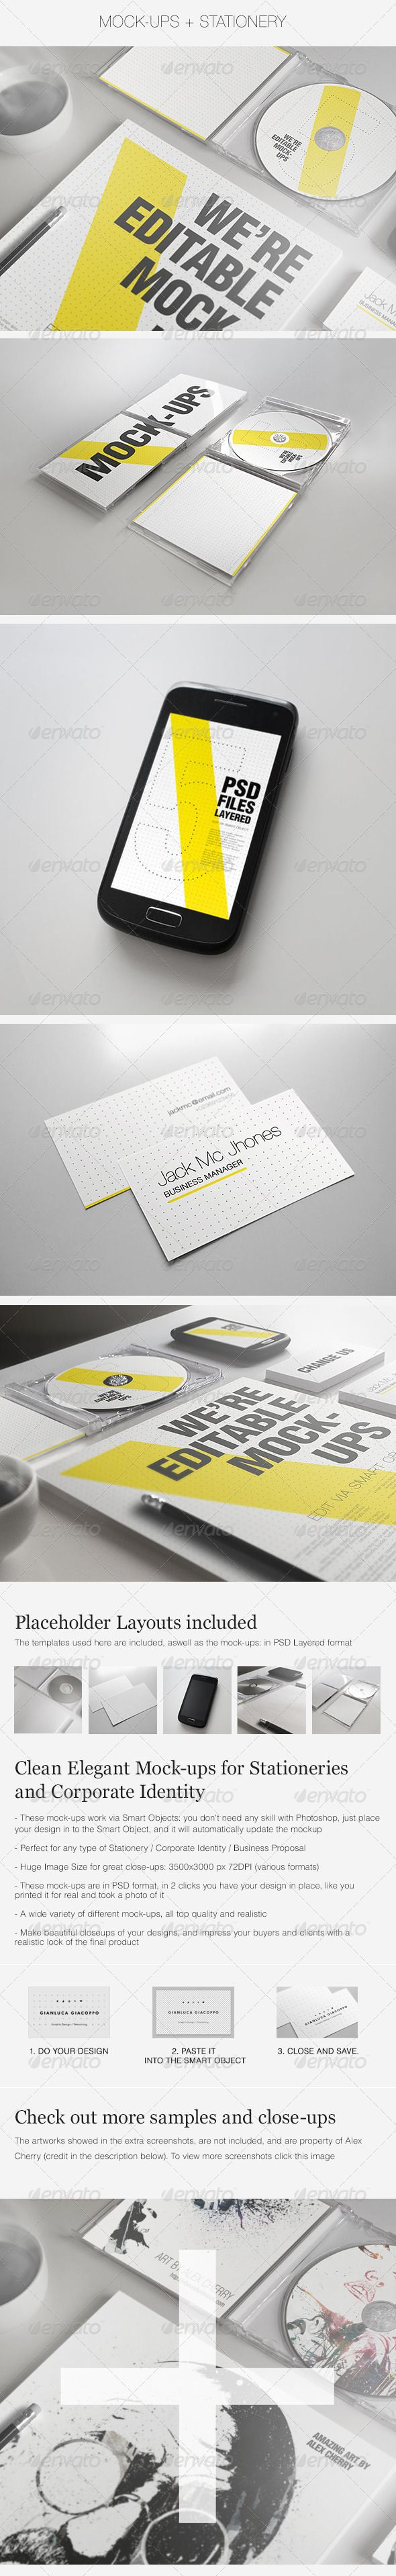 Realistic Stationery Mockups Set 2- Corporate ID